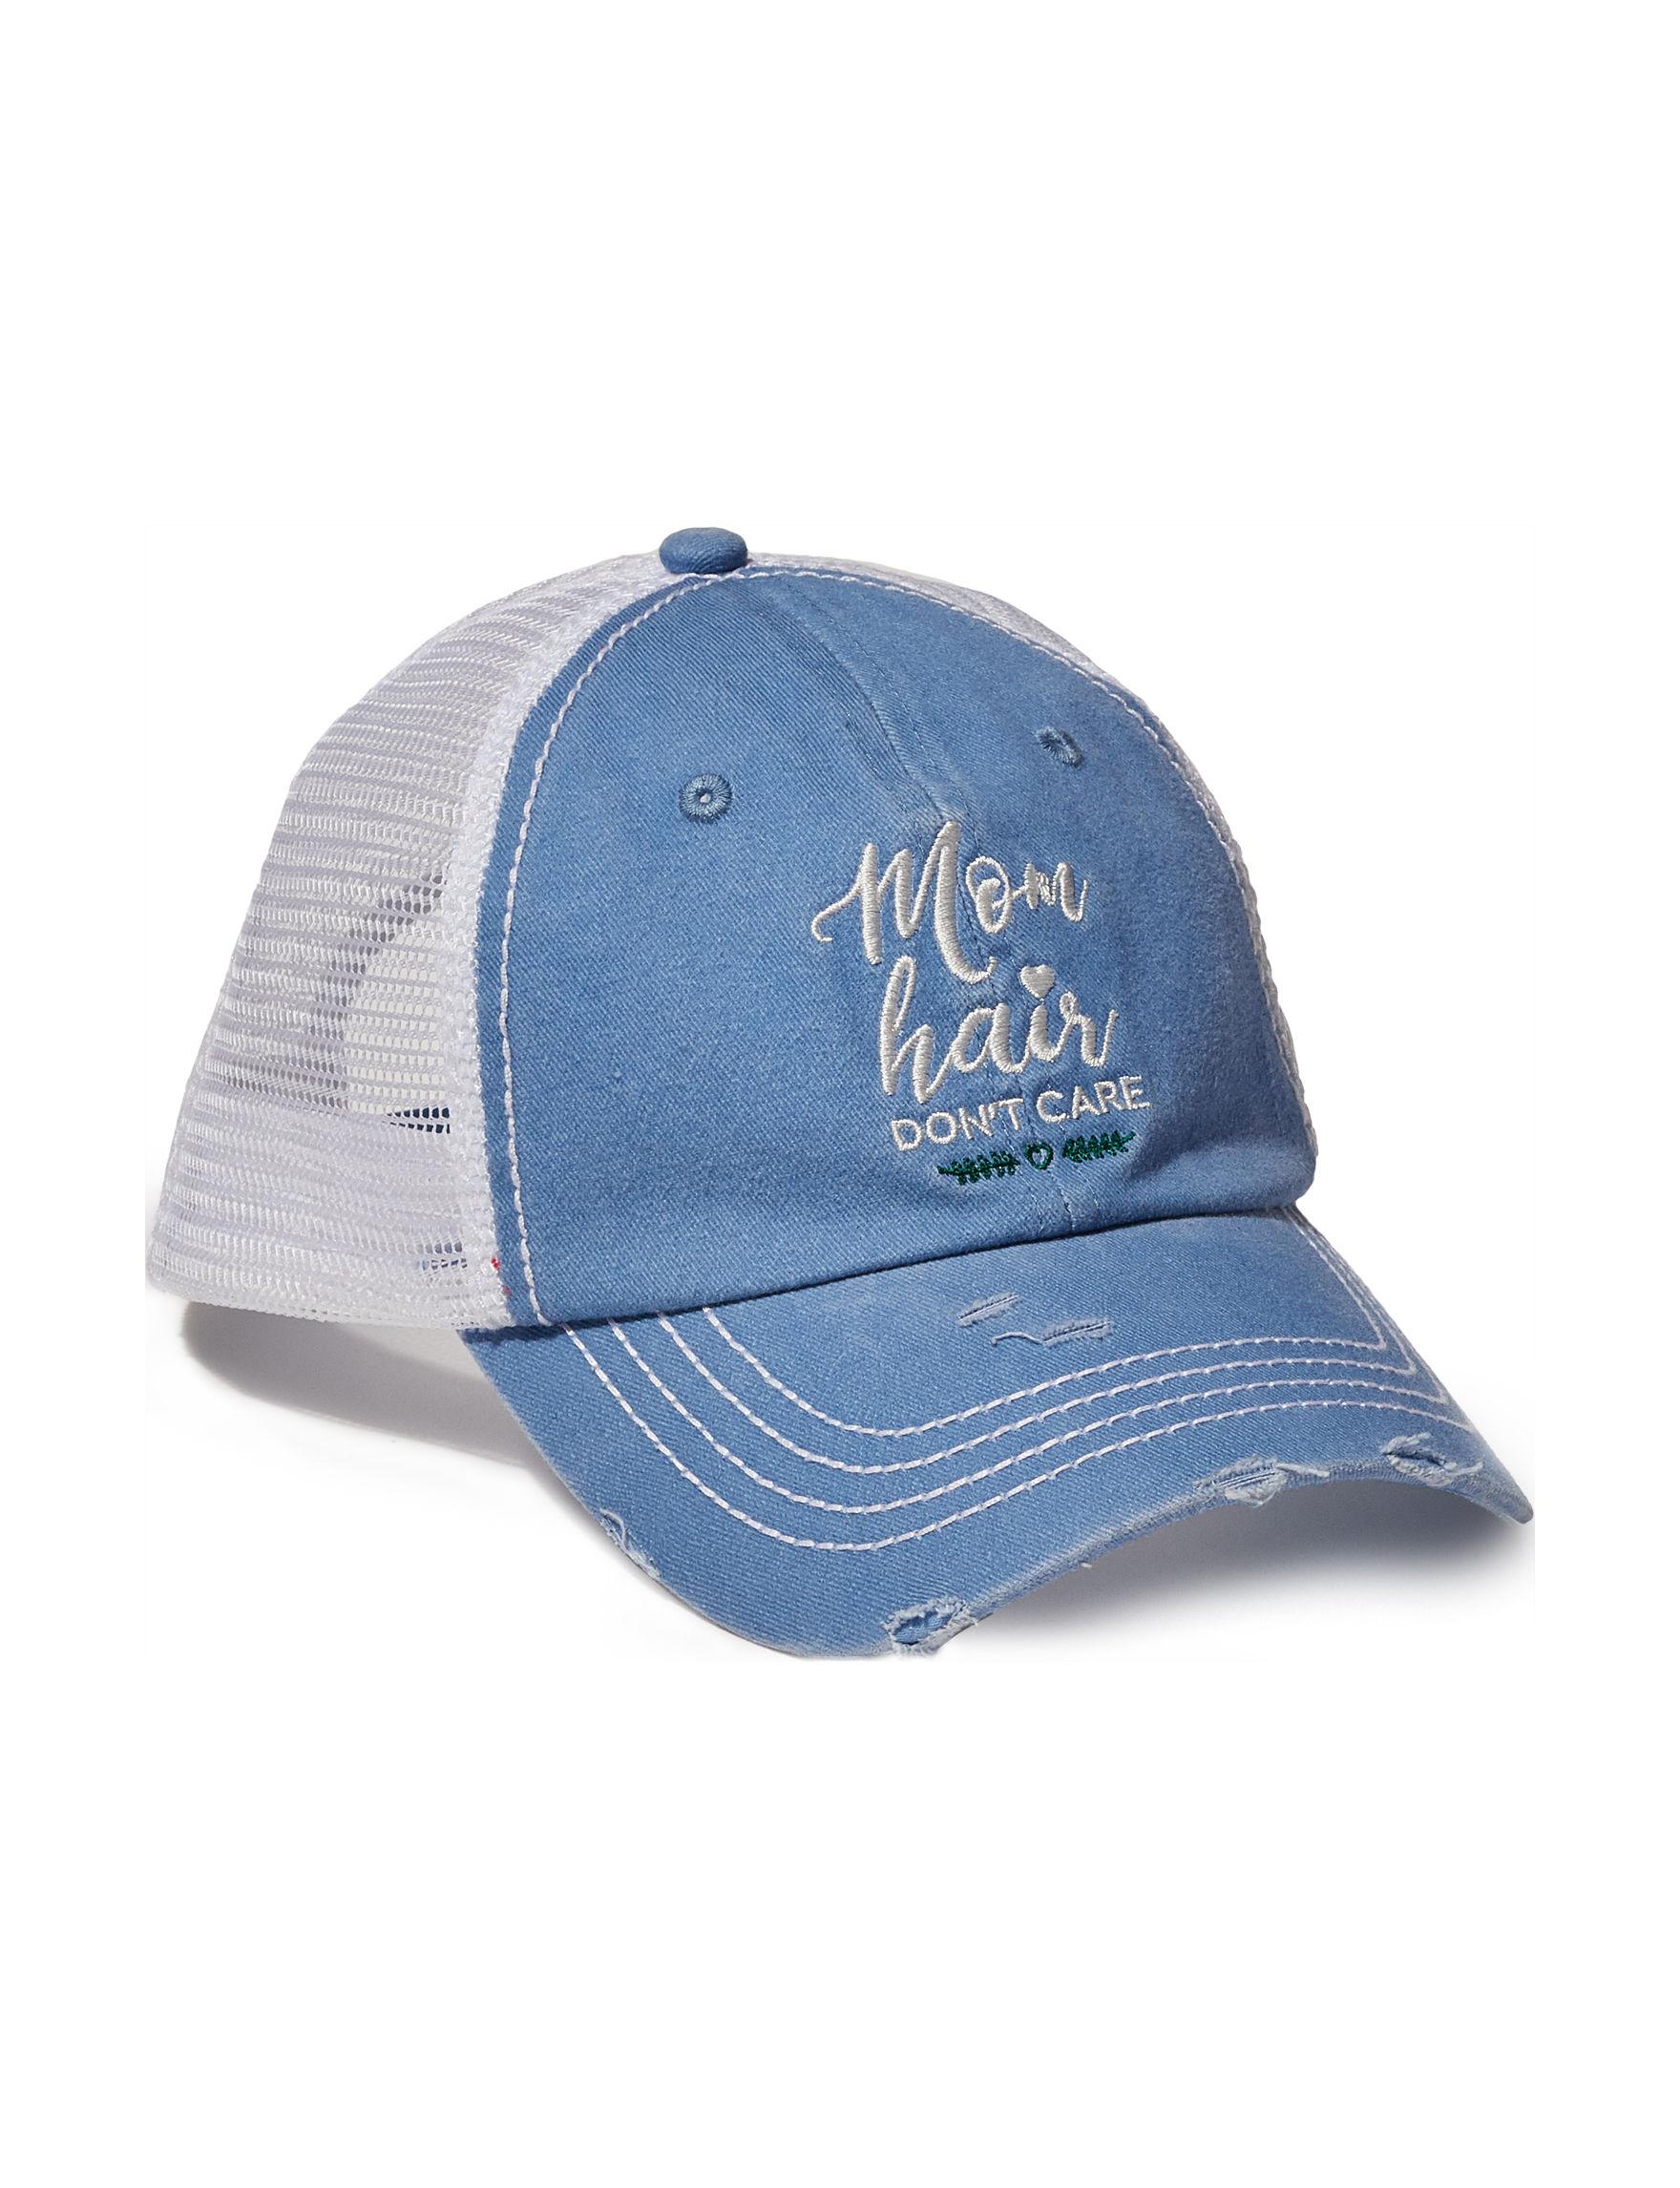 David & Young Blue / White Hats & Headwear